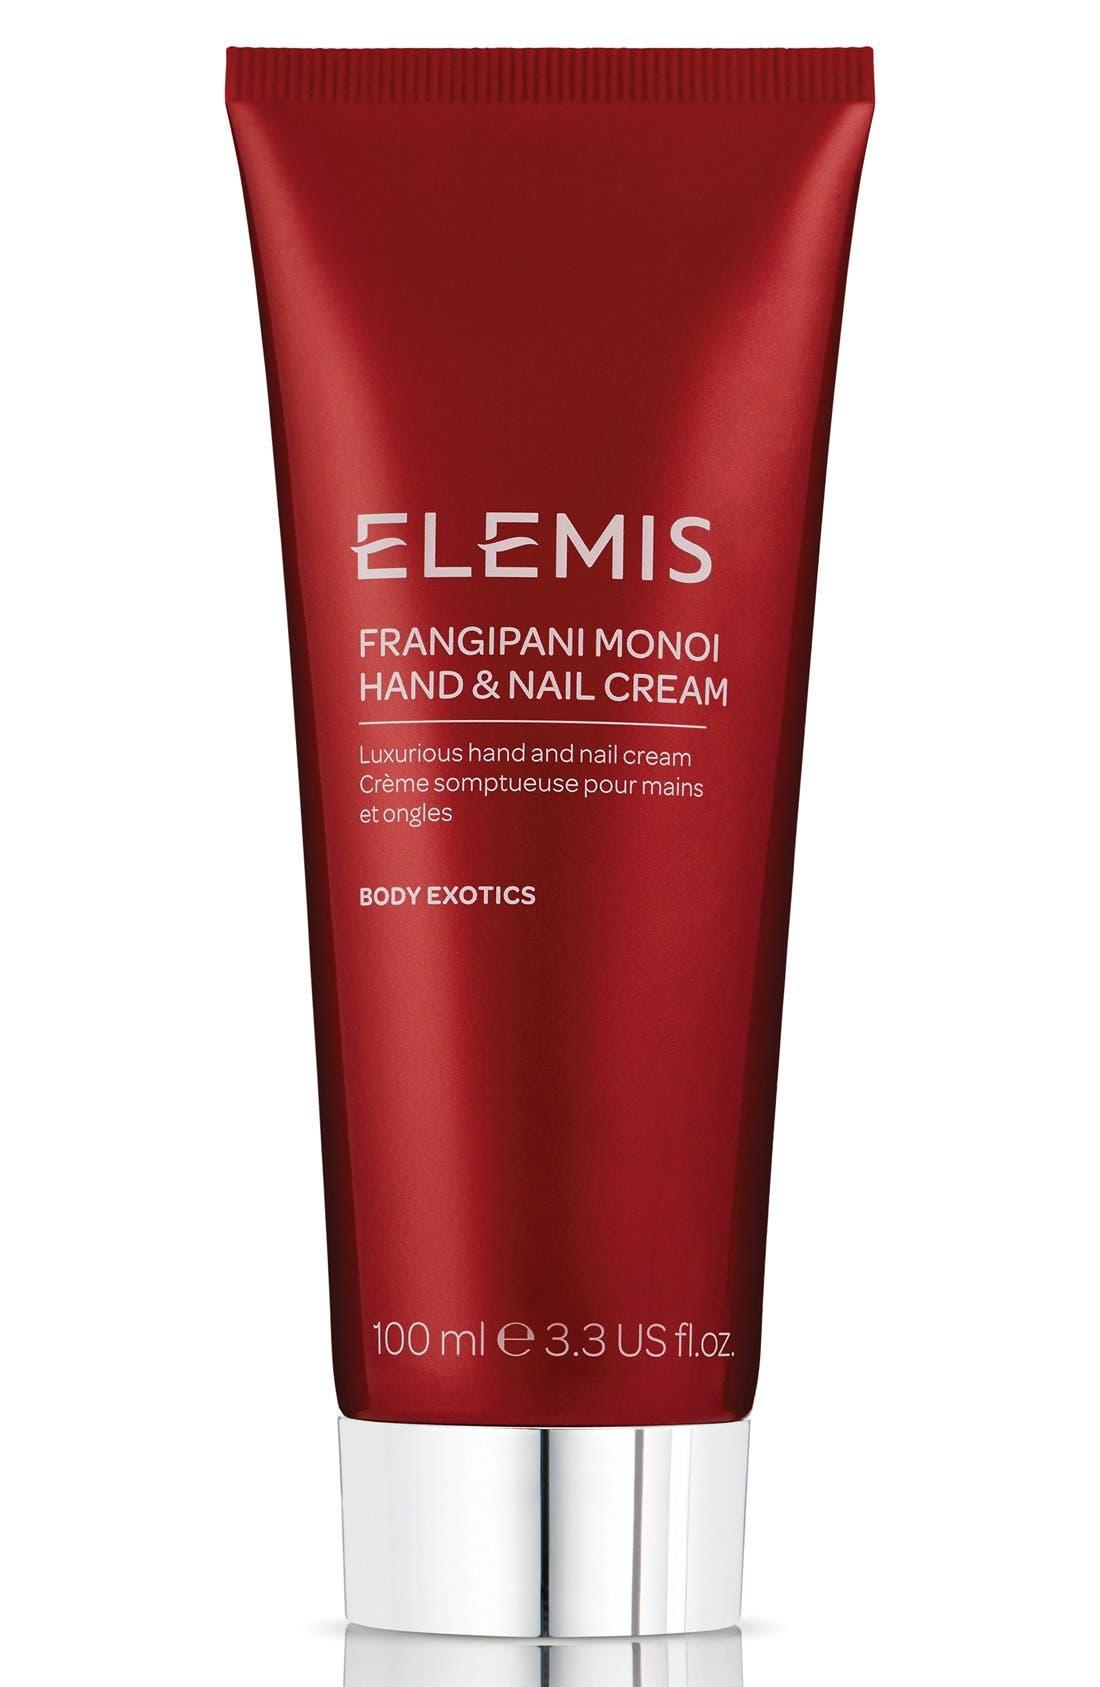 Elemis Frangipani Monoi Hand & Nail Cream